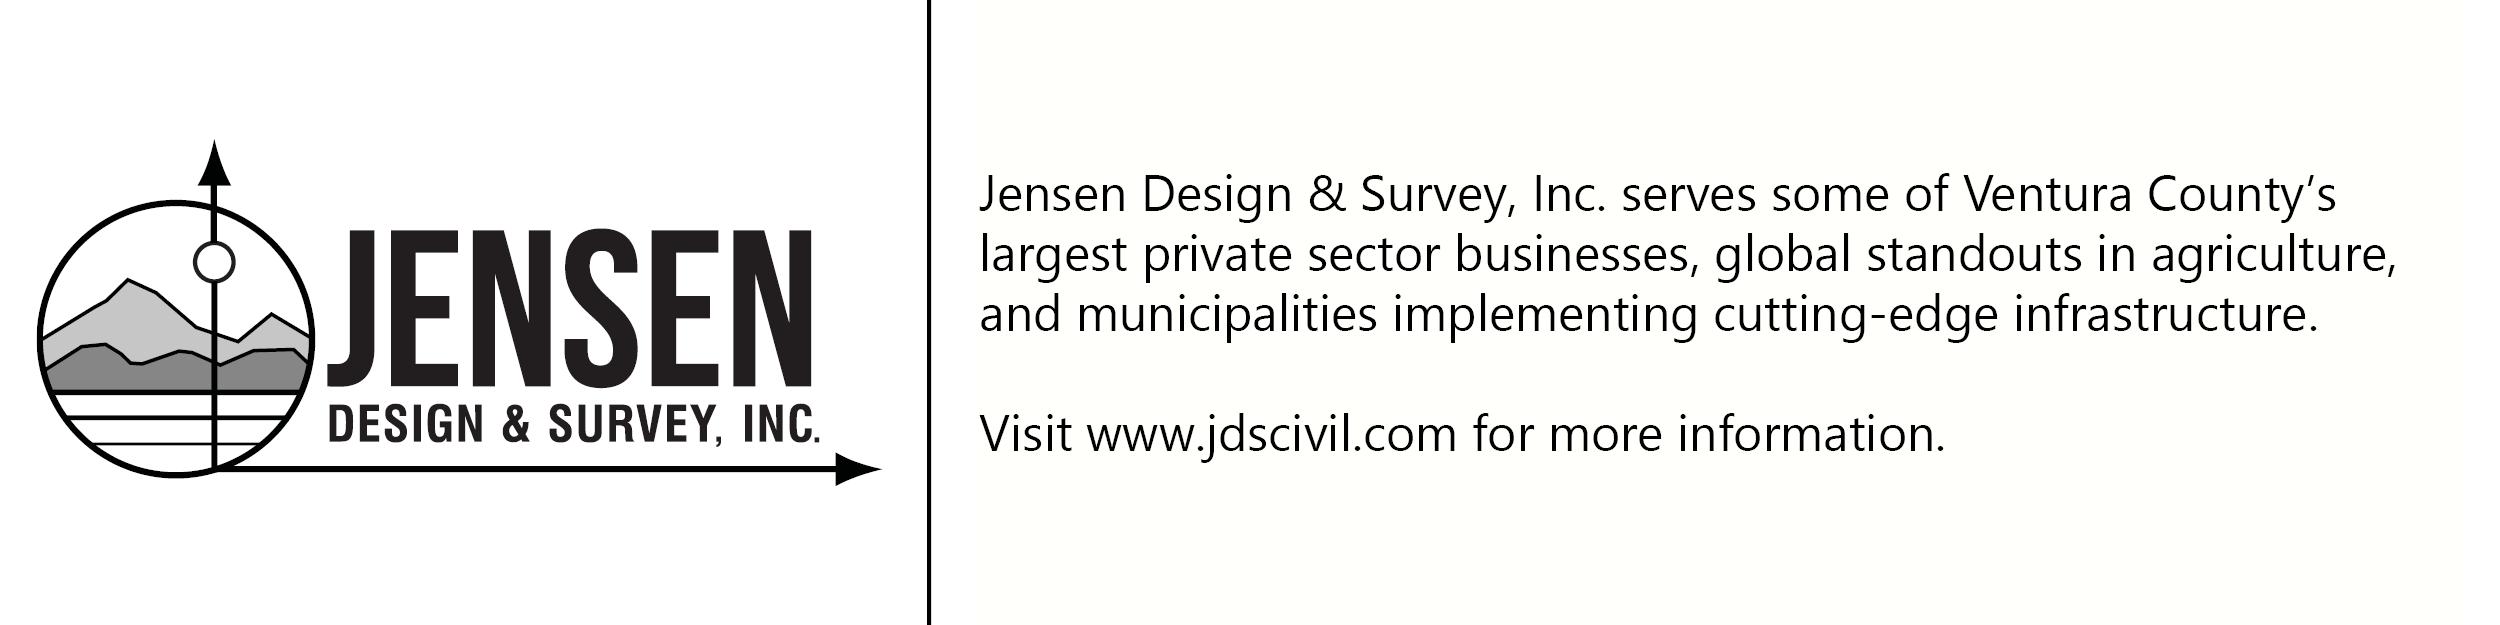 Jensen logo with description of company